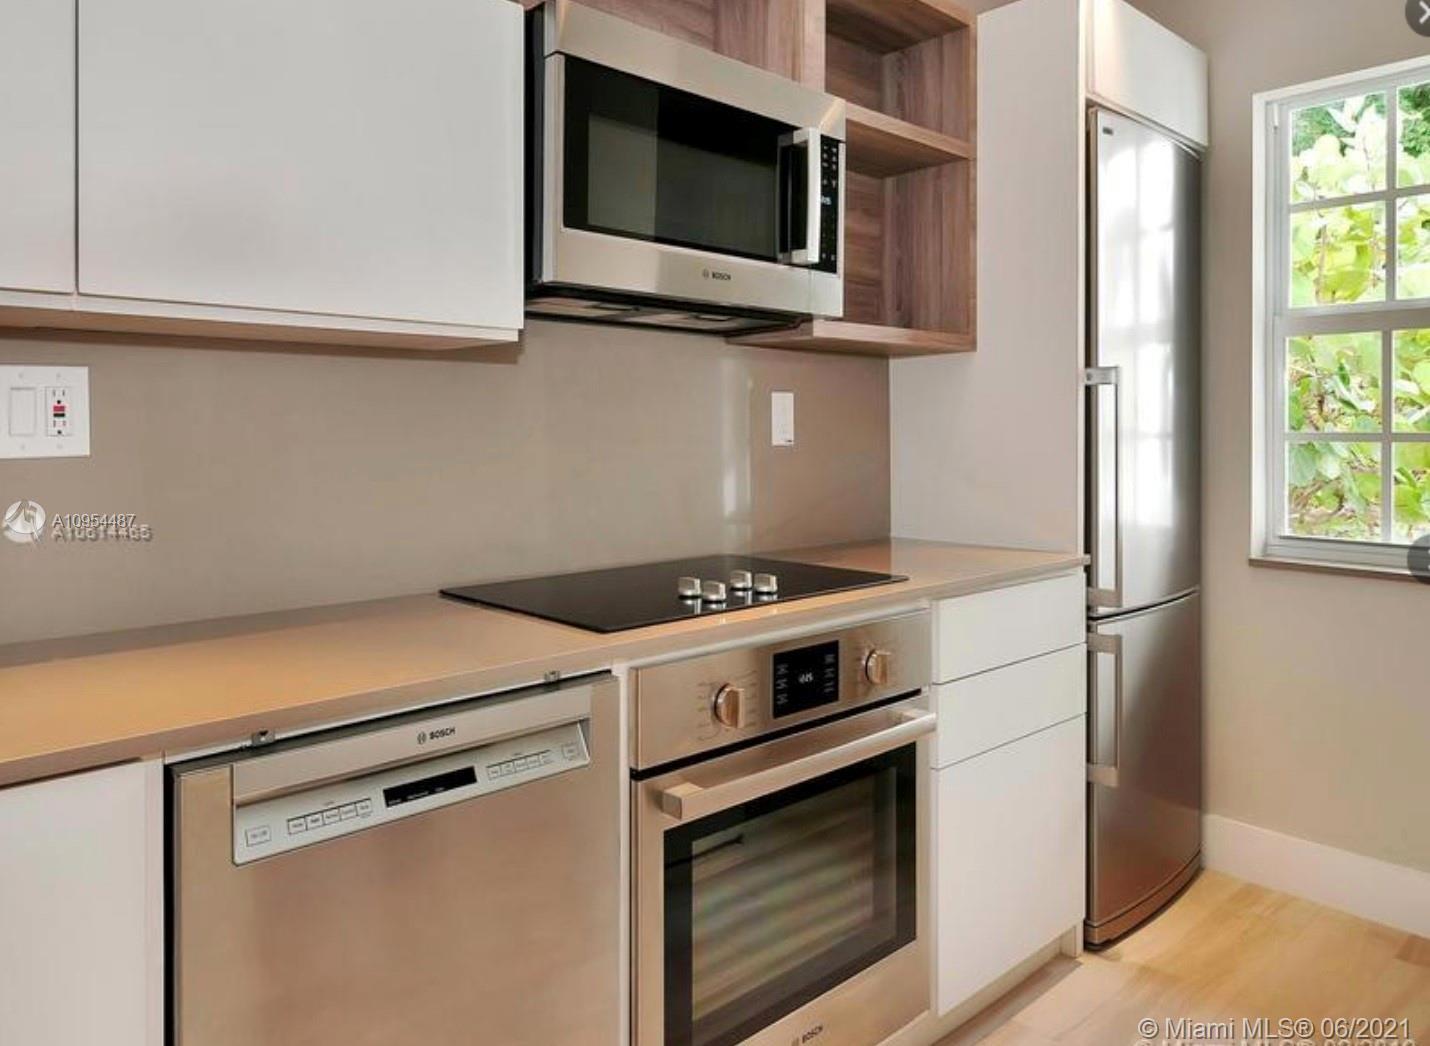 /  4508 sq. ft. $ 2020-11-07 0 Photo